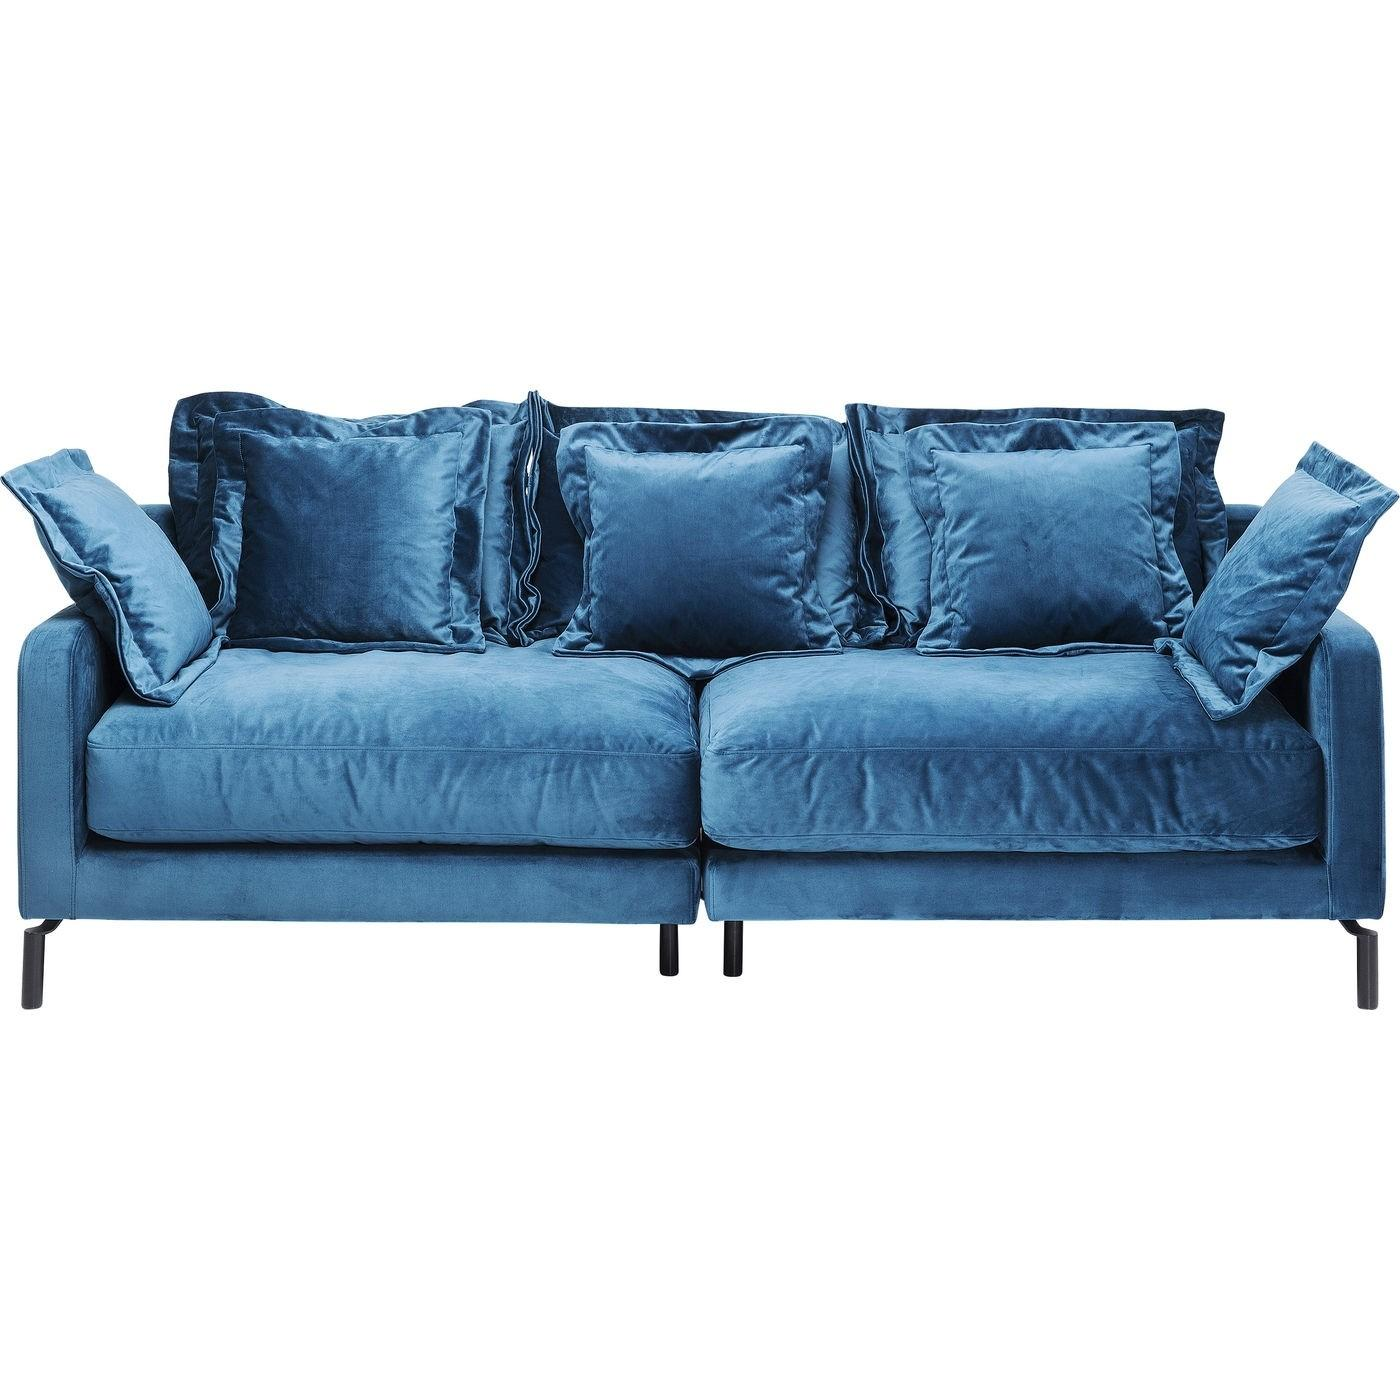 Sofa Blau 2 Sitzer